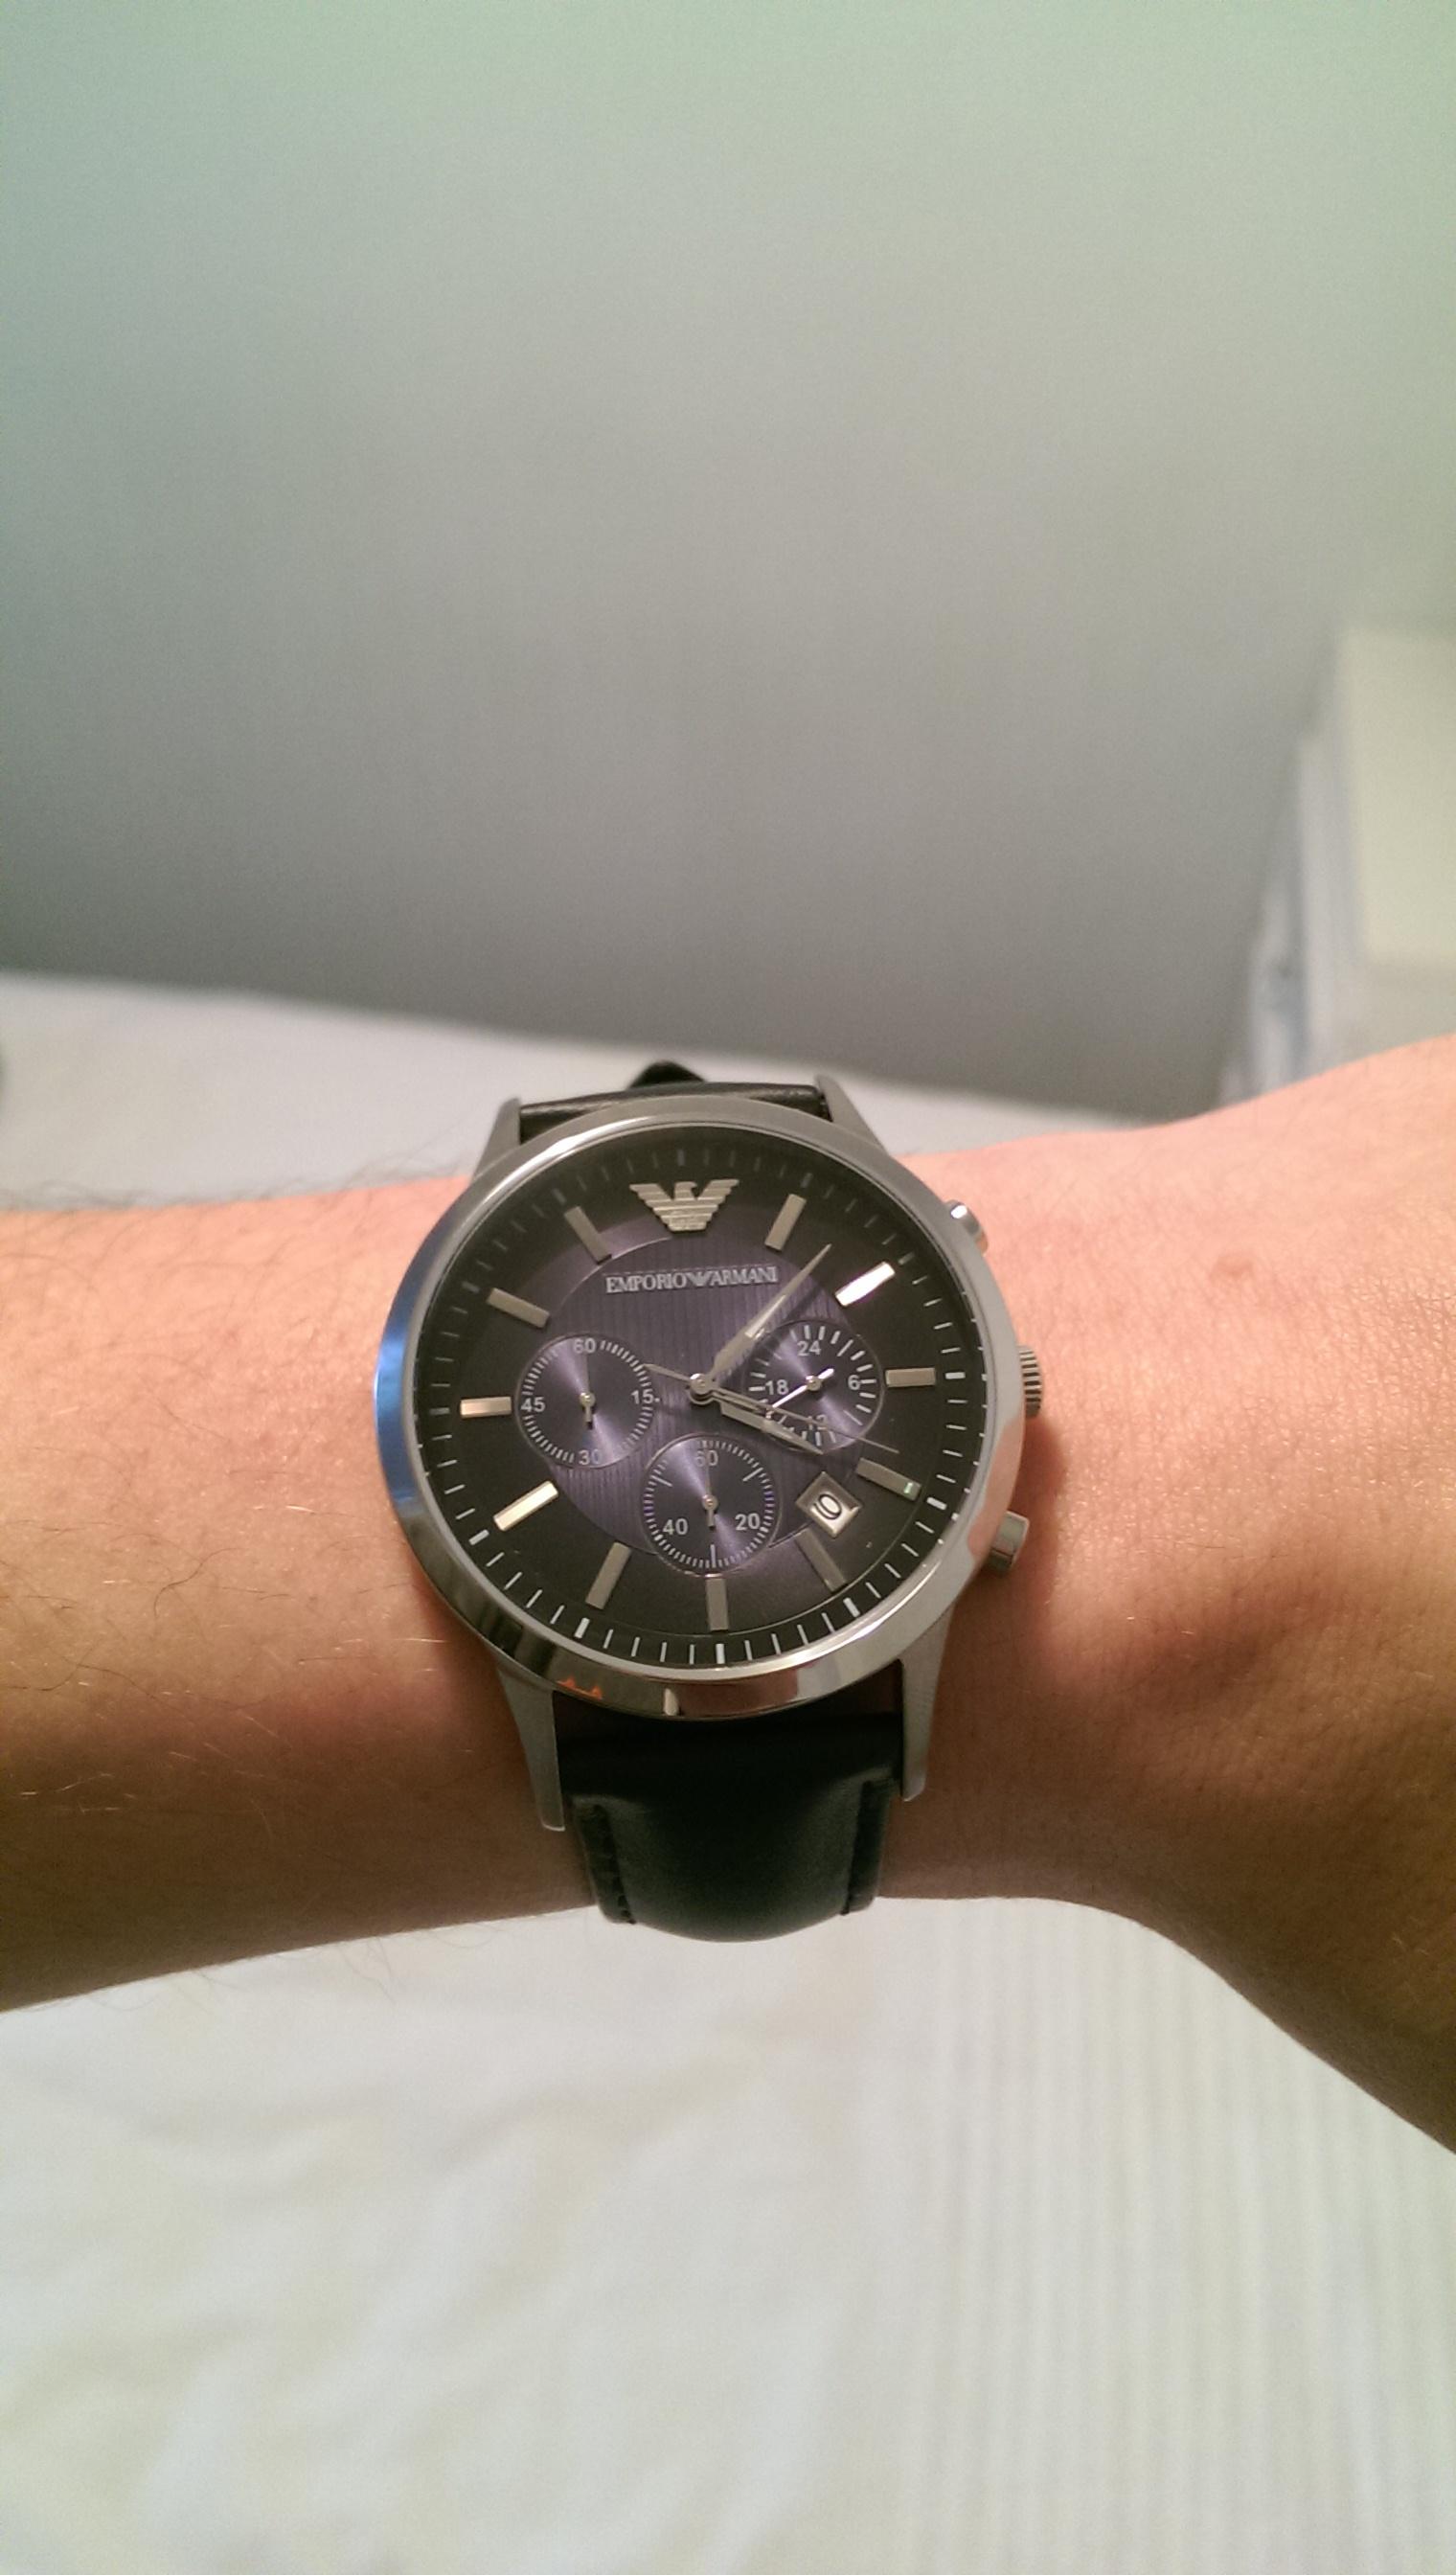 9a8a00e7462 Gents Emporio Armani Chronograph Watch (AR2473)